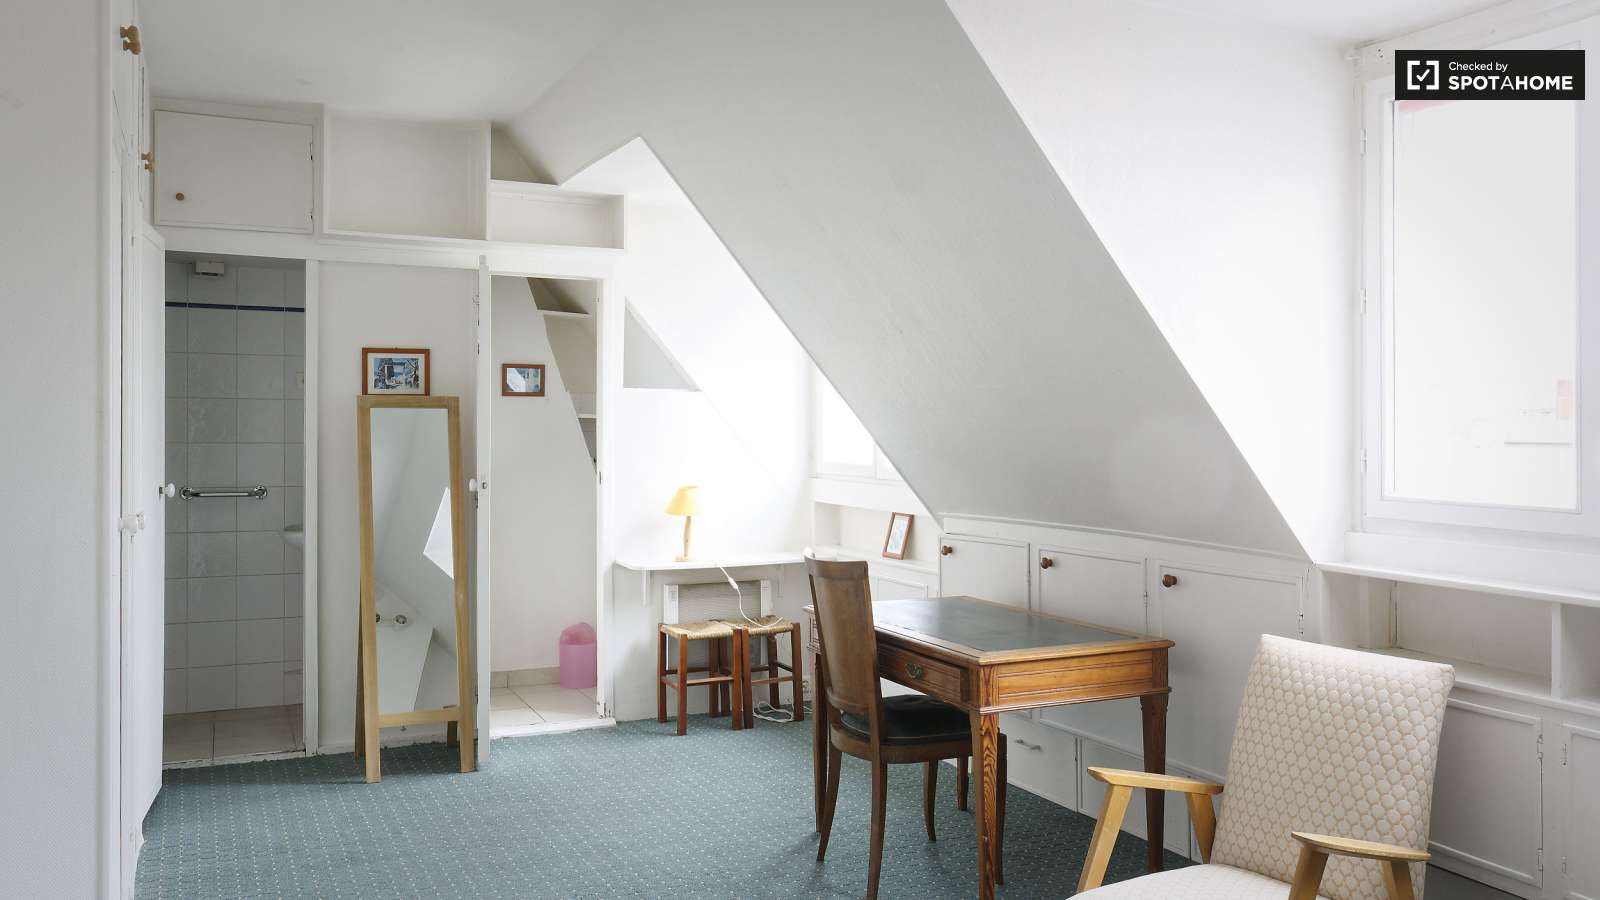 Cosy studio apartment for rent in Luxembourg, Paris 6 (ref: 106850 ...